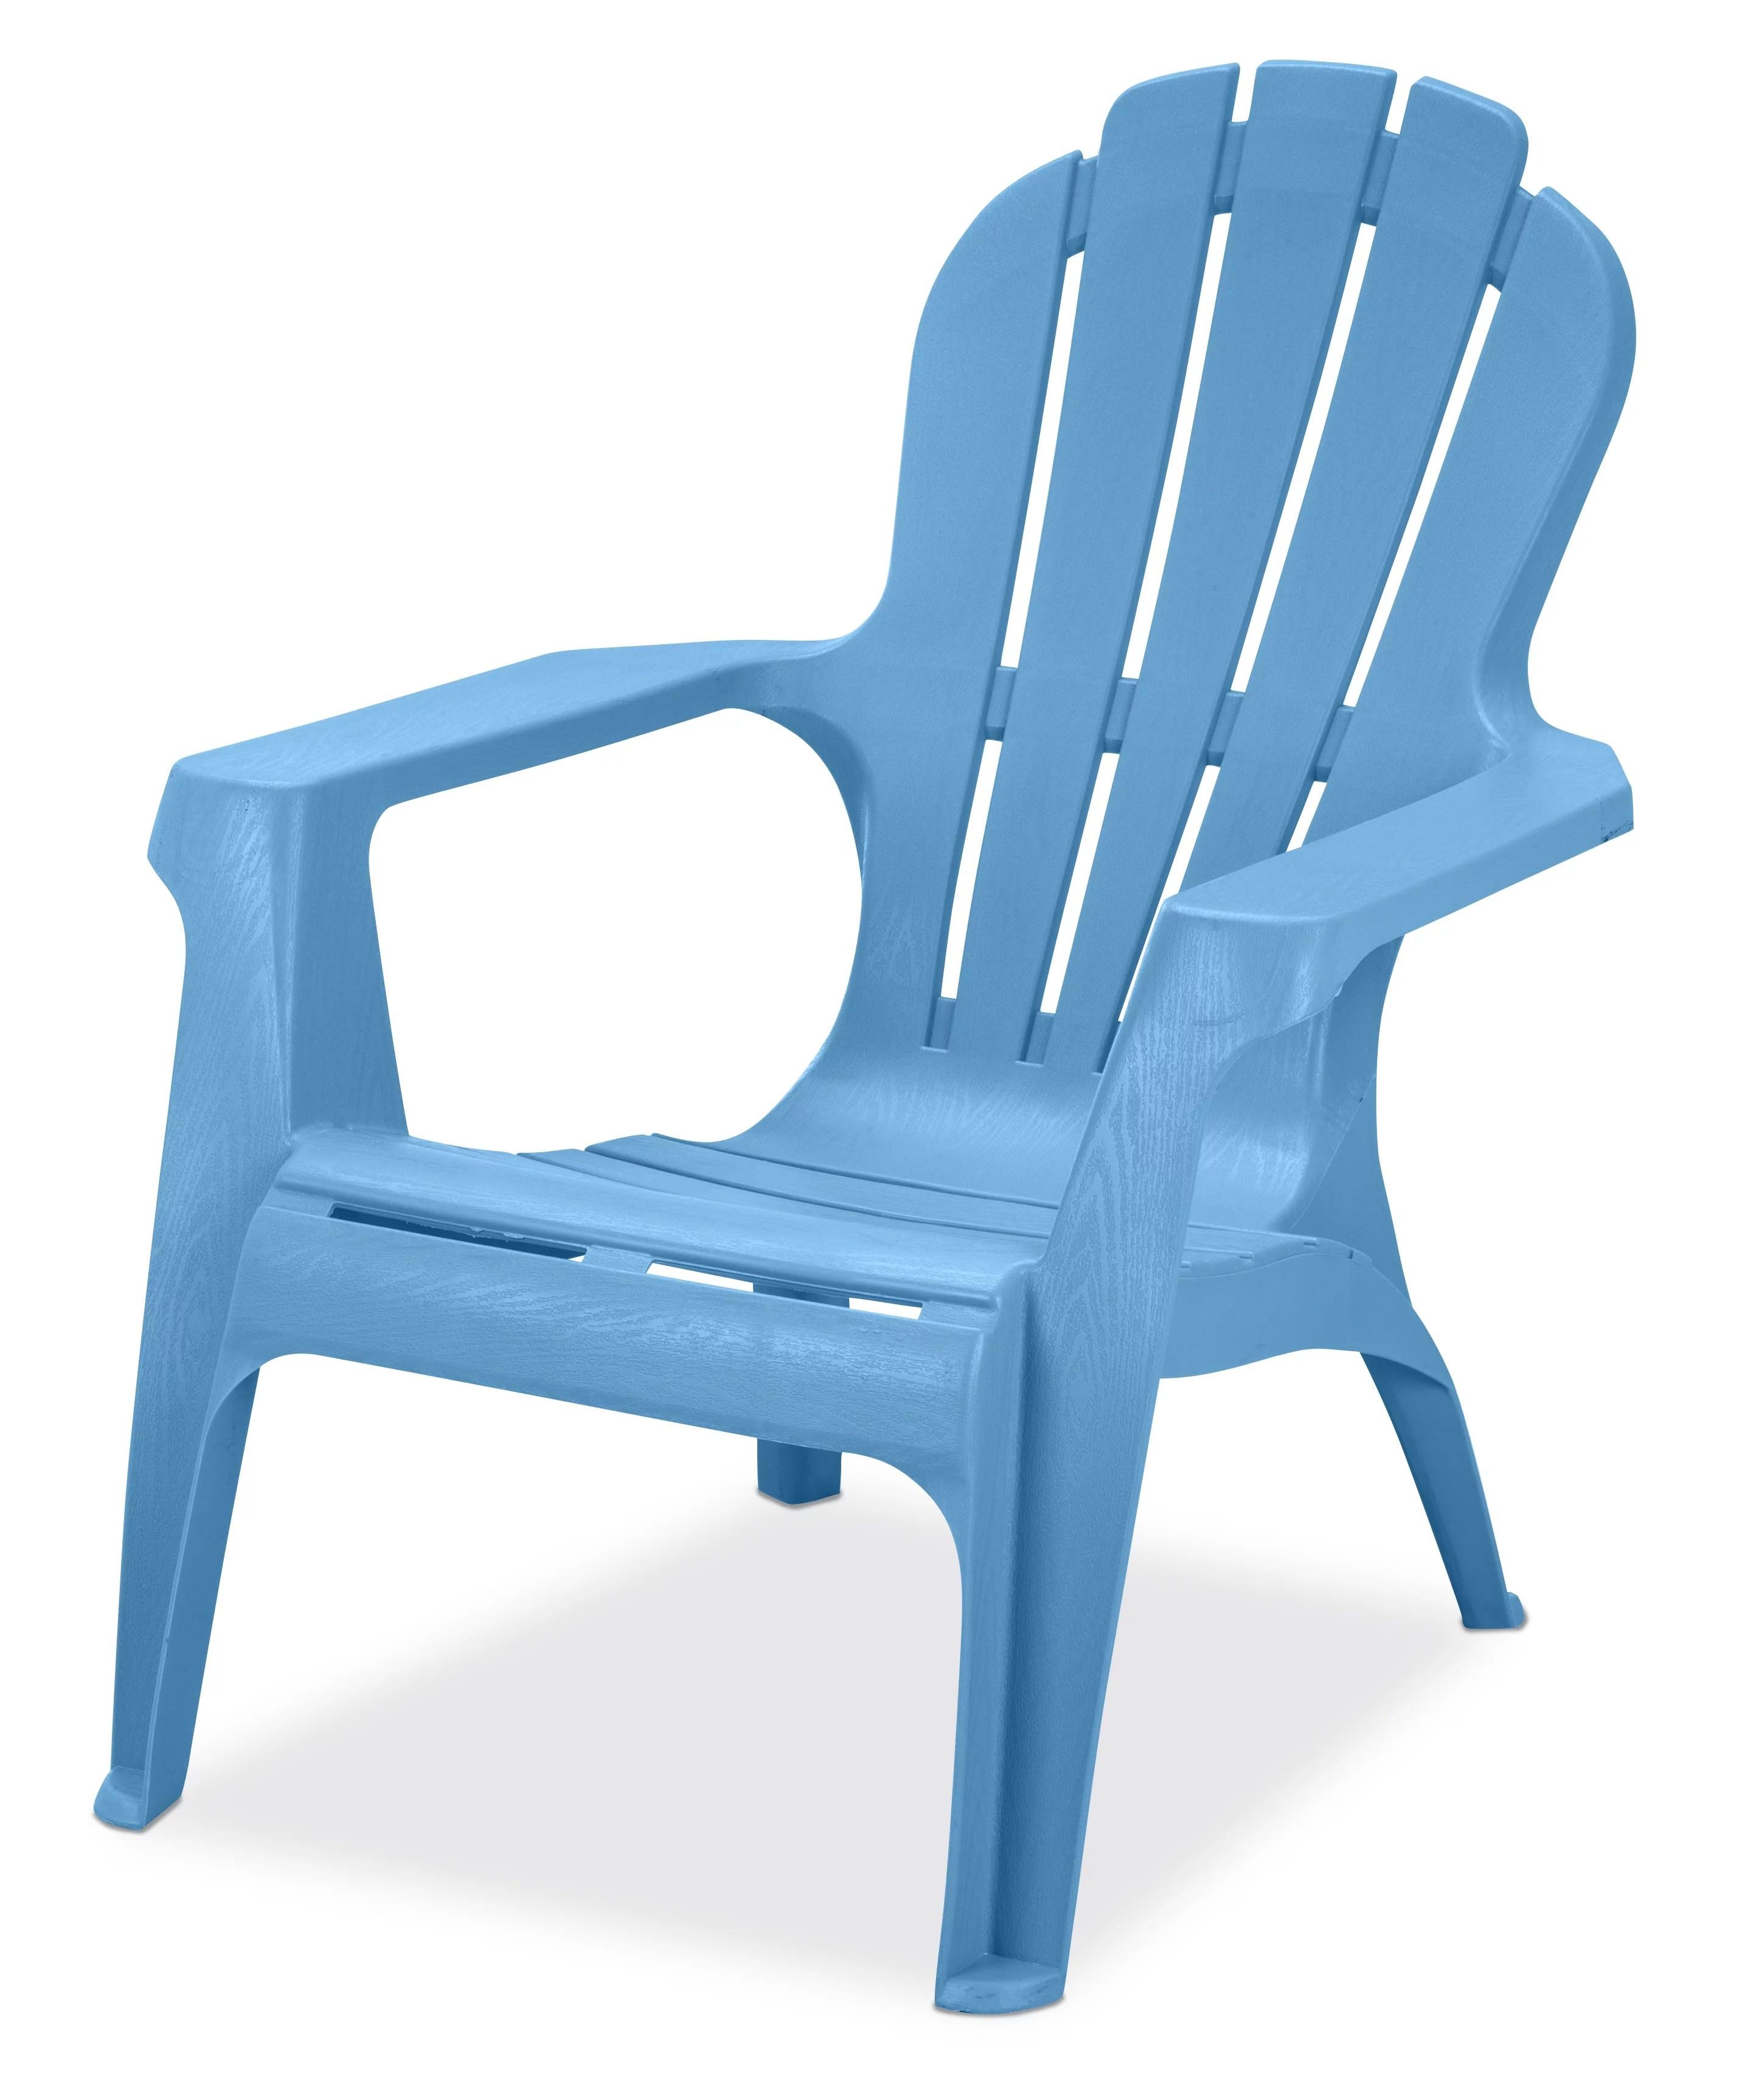 us leisure resin adirondack plastic patio furniture chair blue